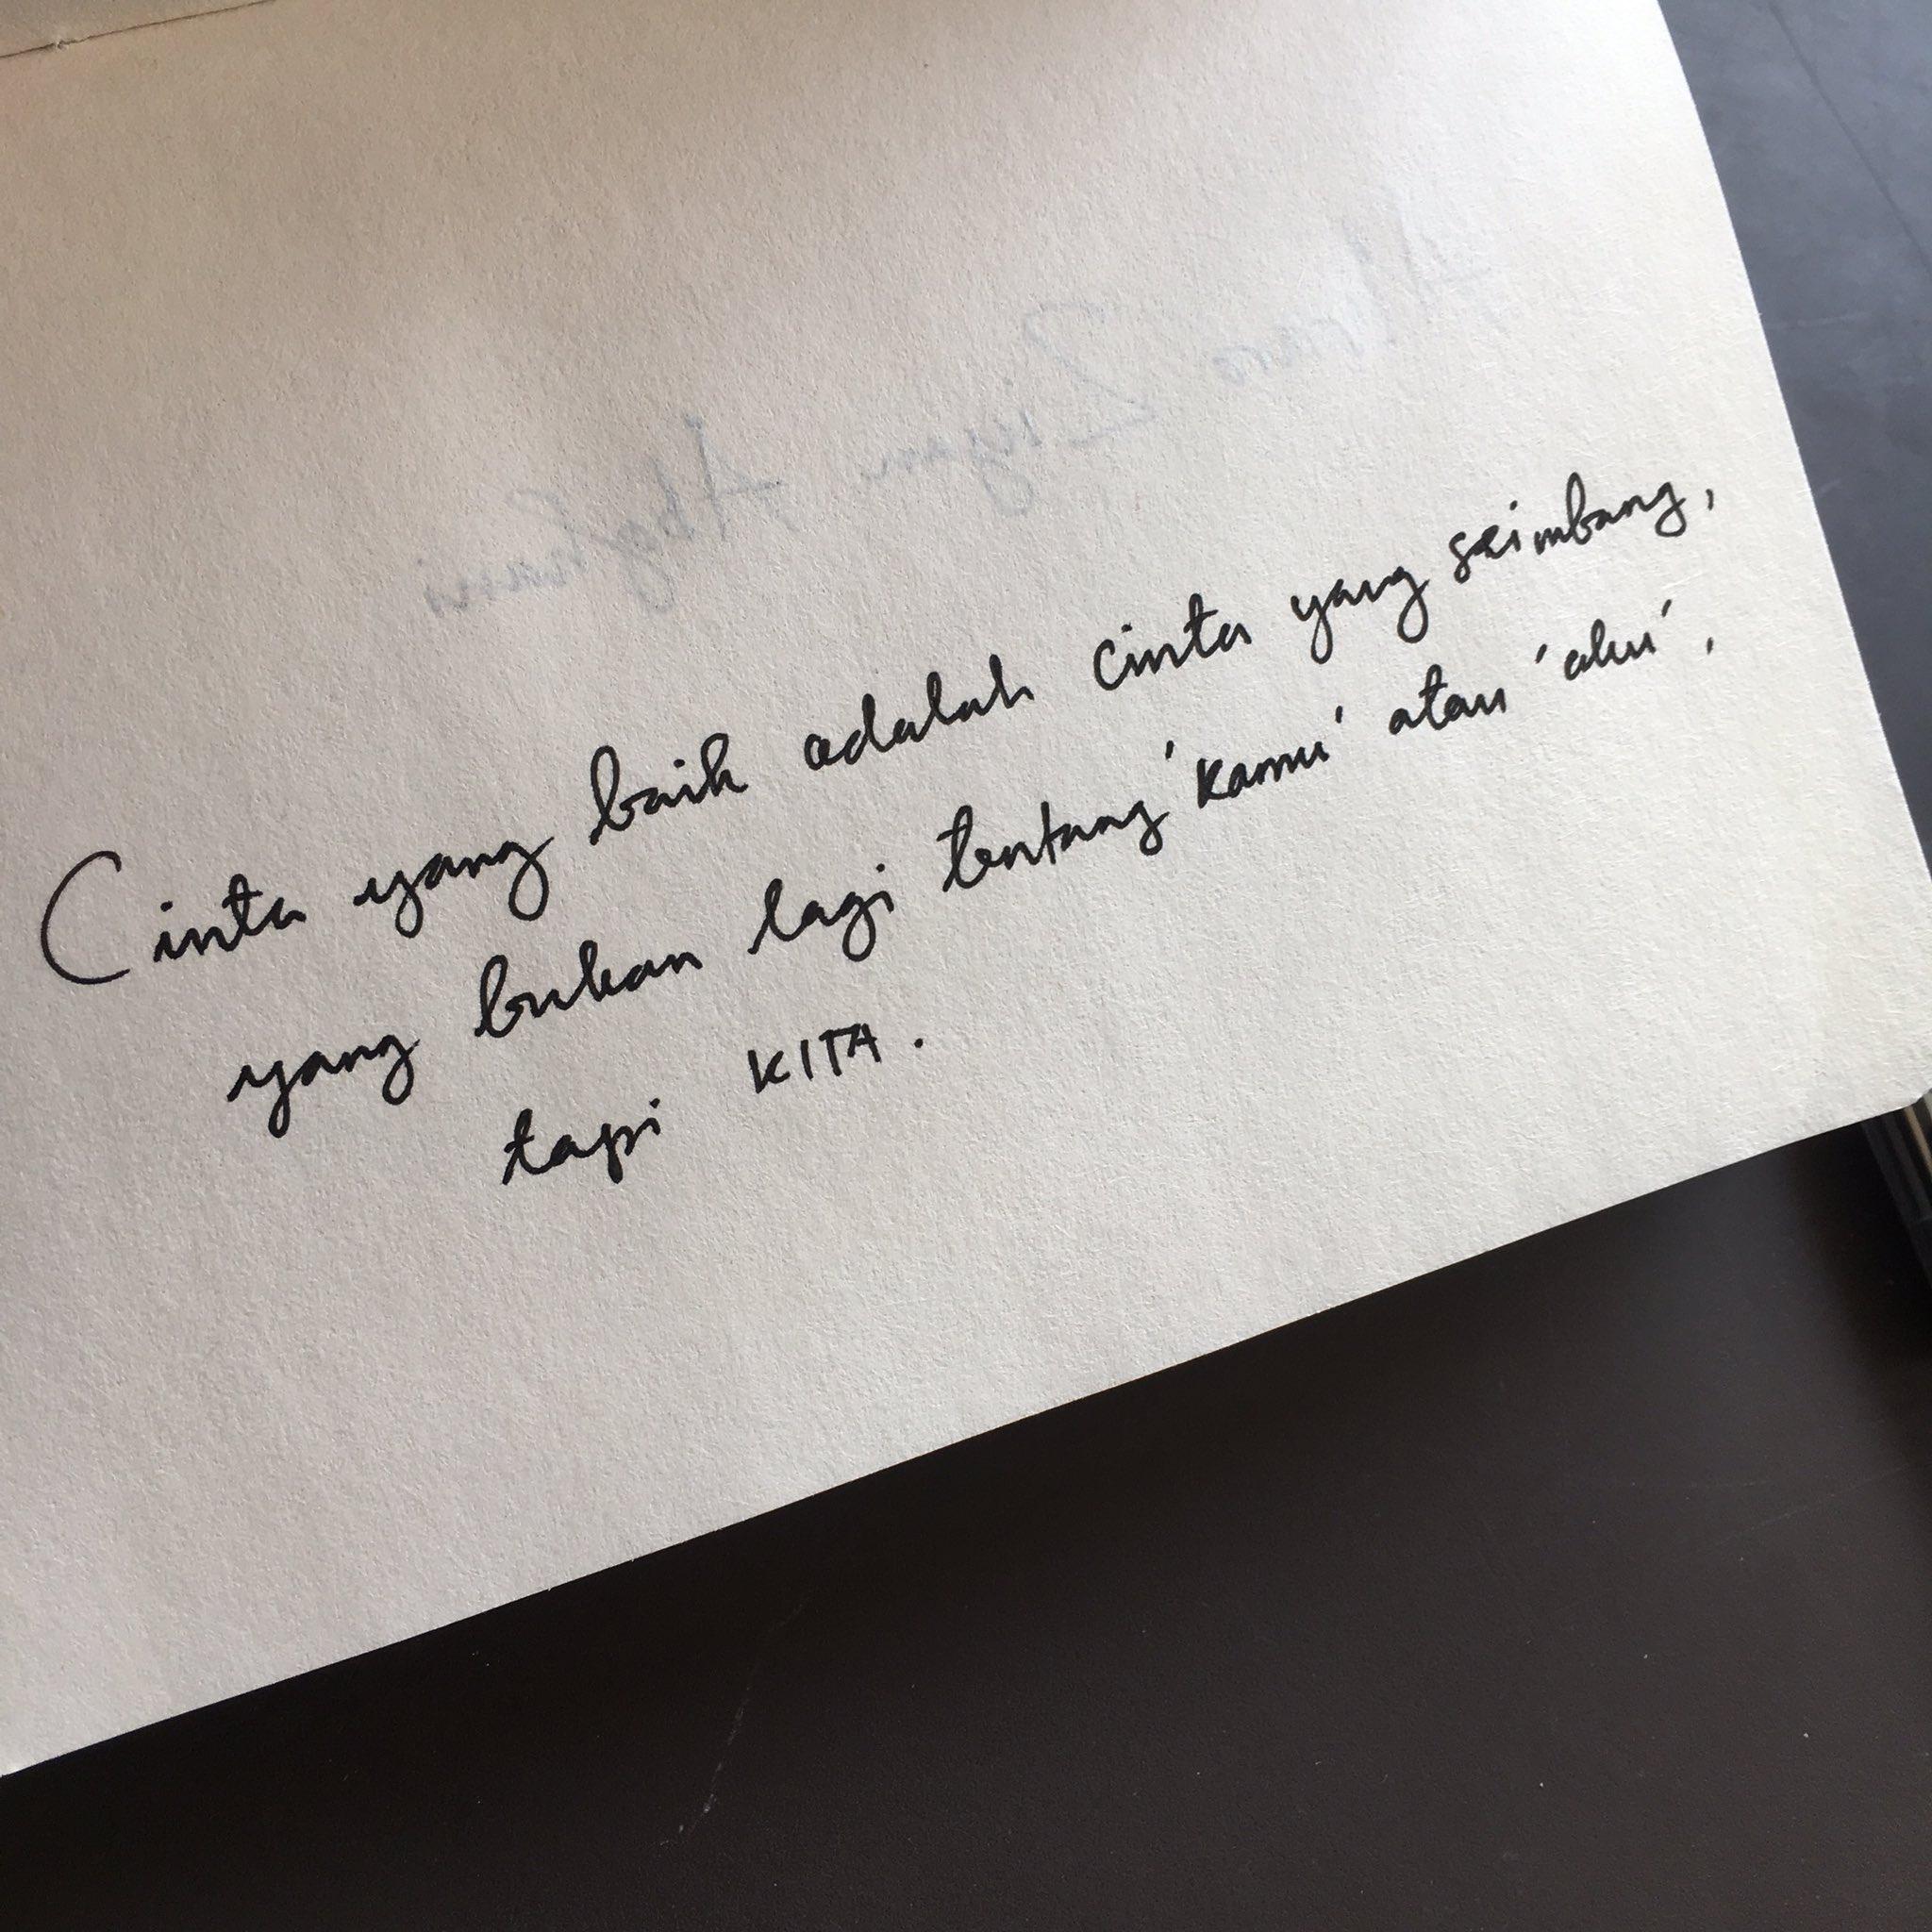 huba huba on bonus quote cinta cintaan senja kekinian